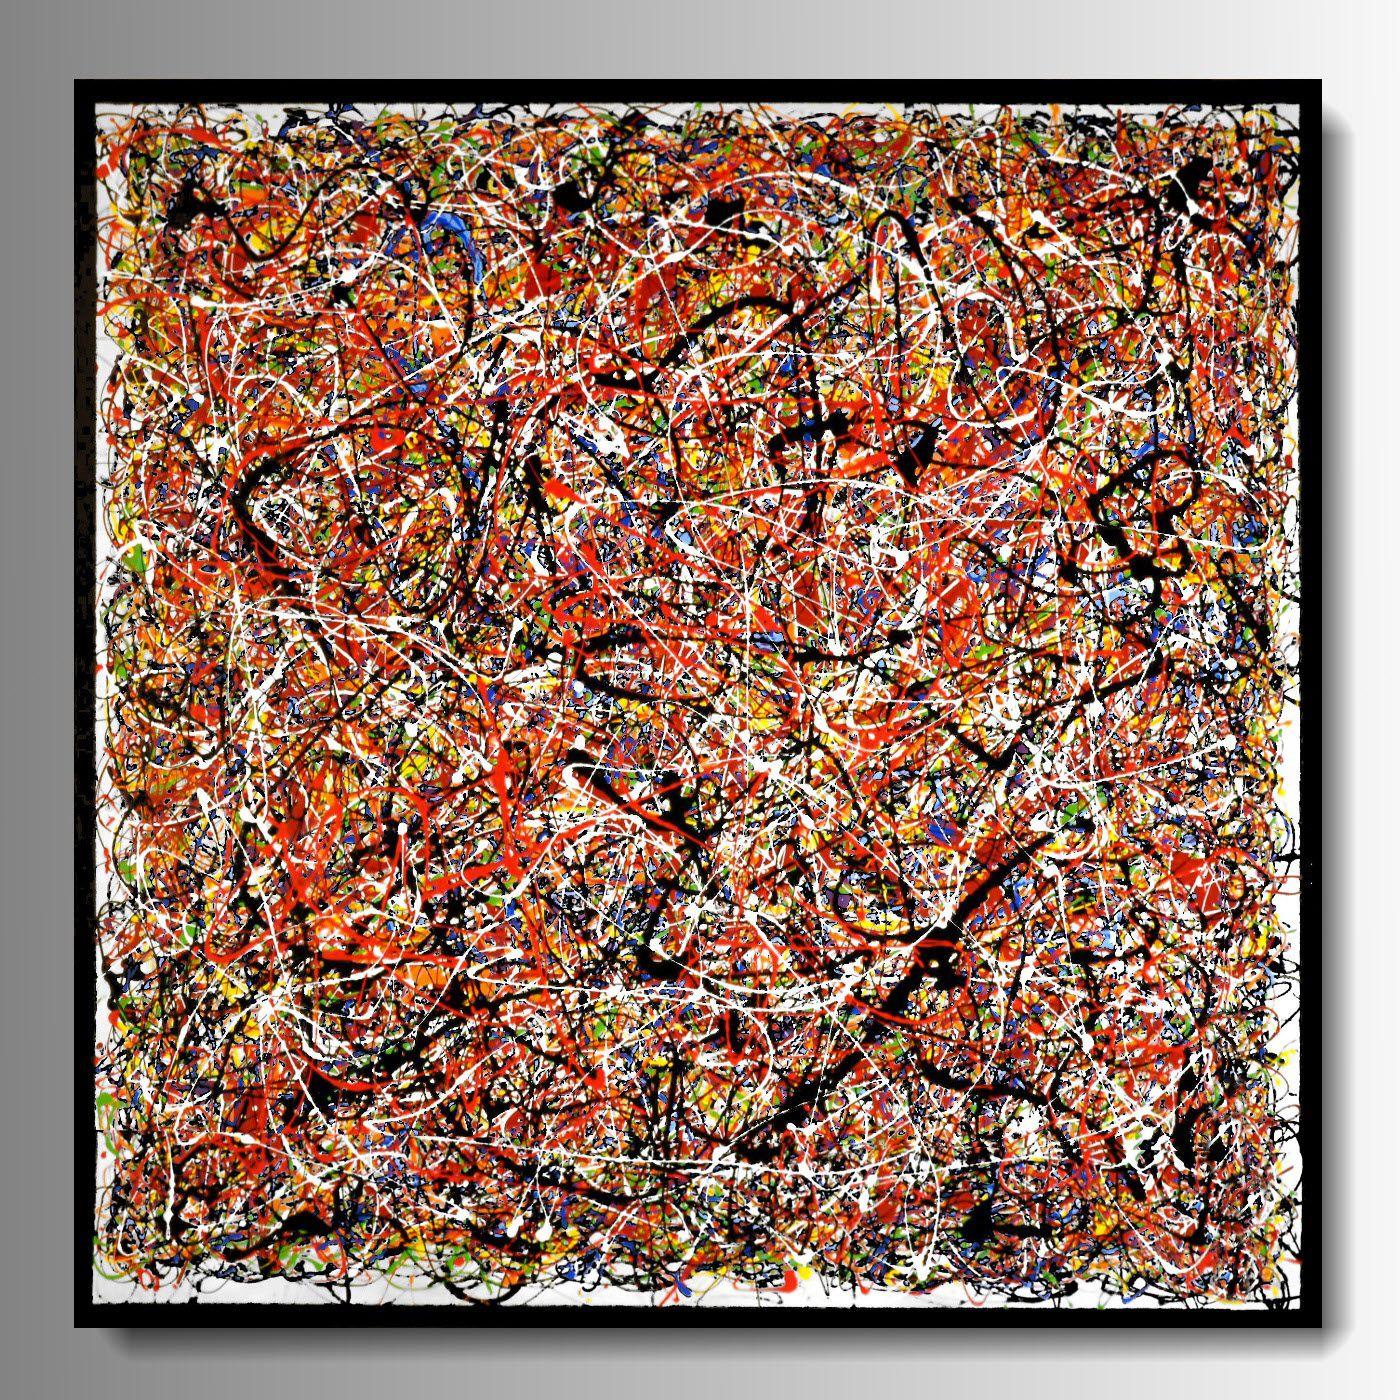 Produzione quadri moderni astratti 100 dipinti a mano for Quadri moderni astratti dipinti mano